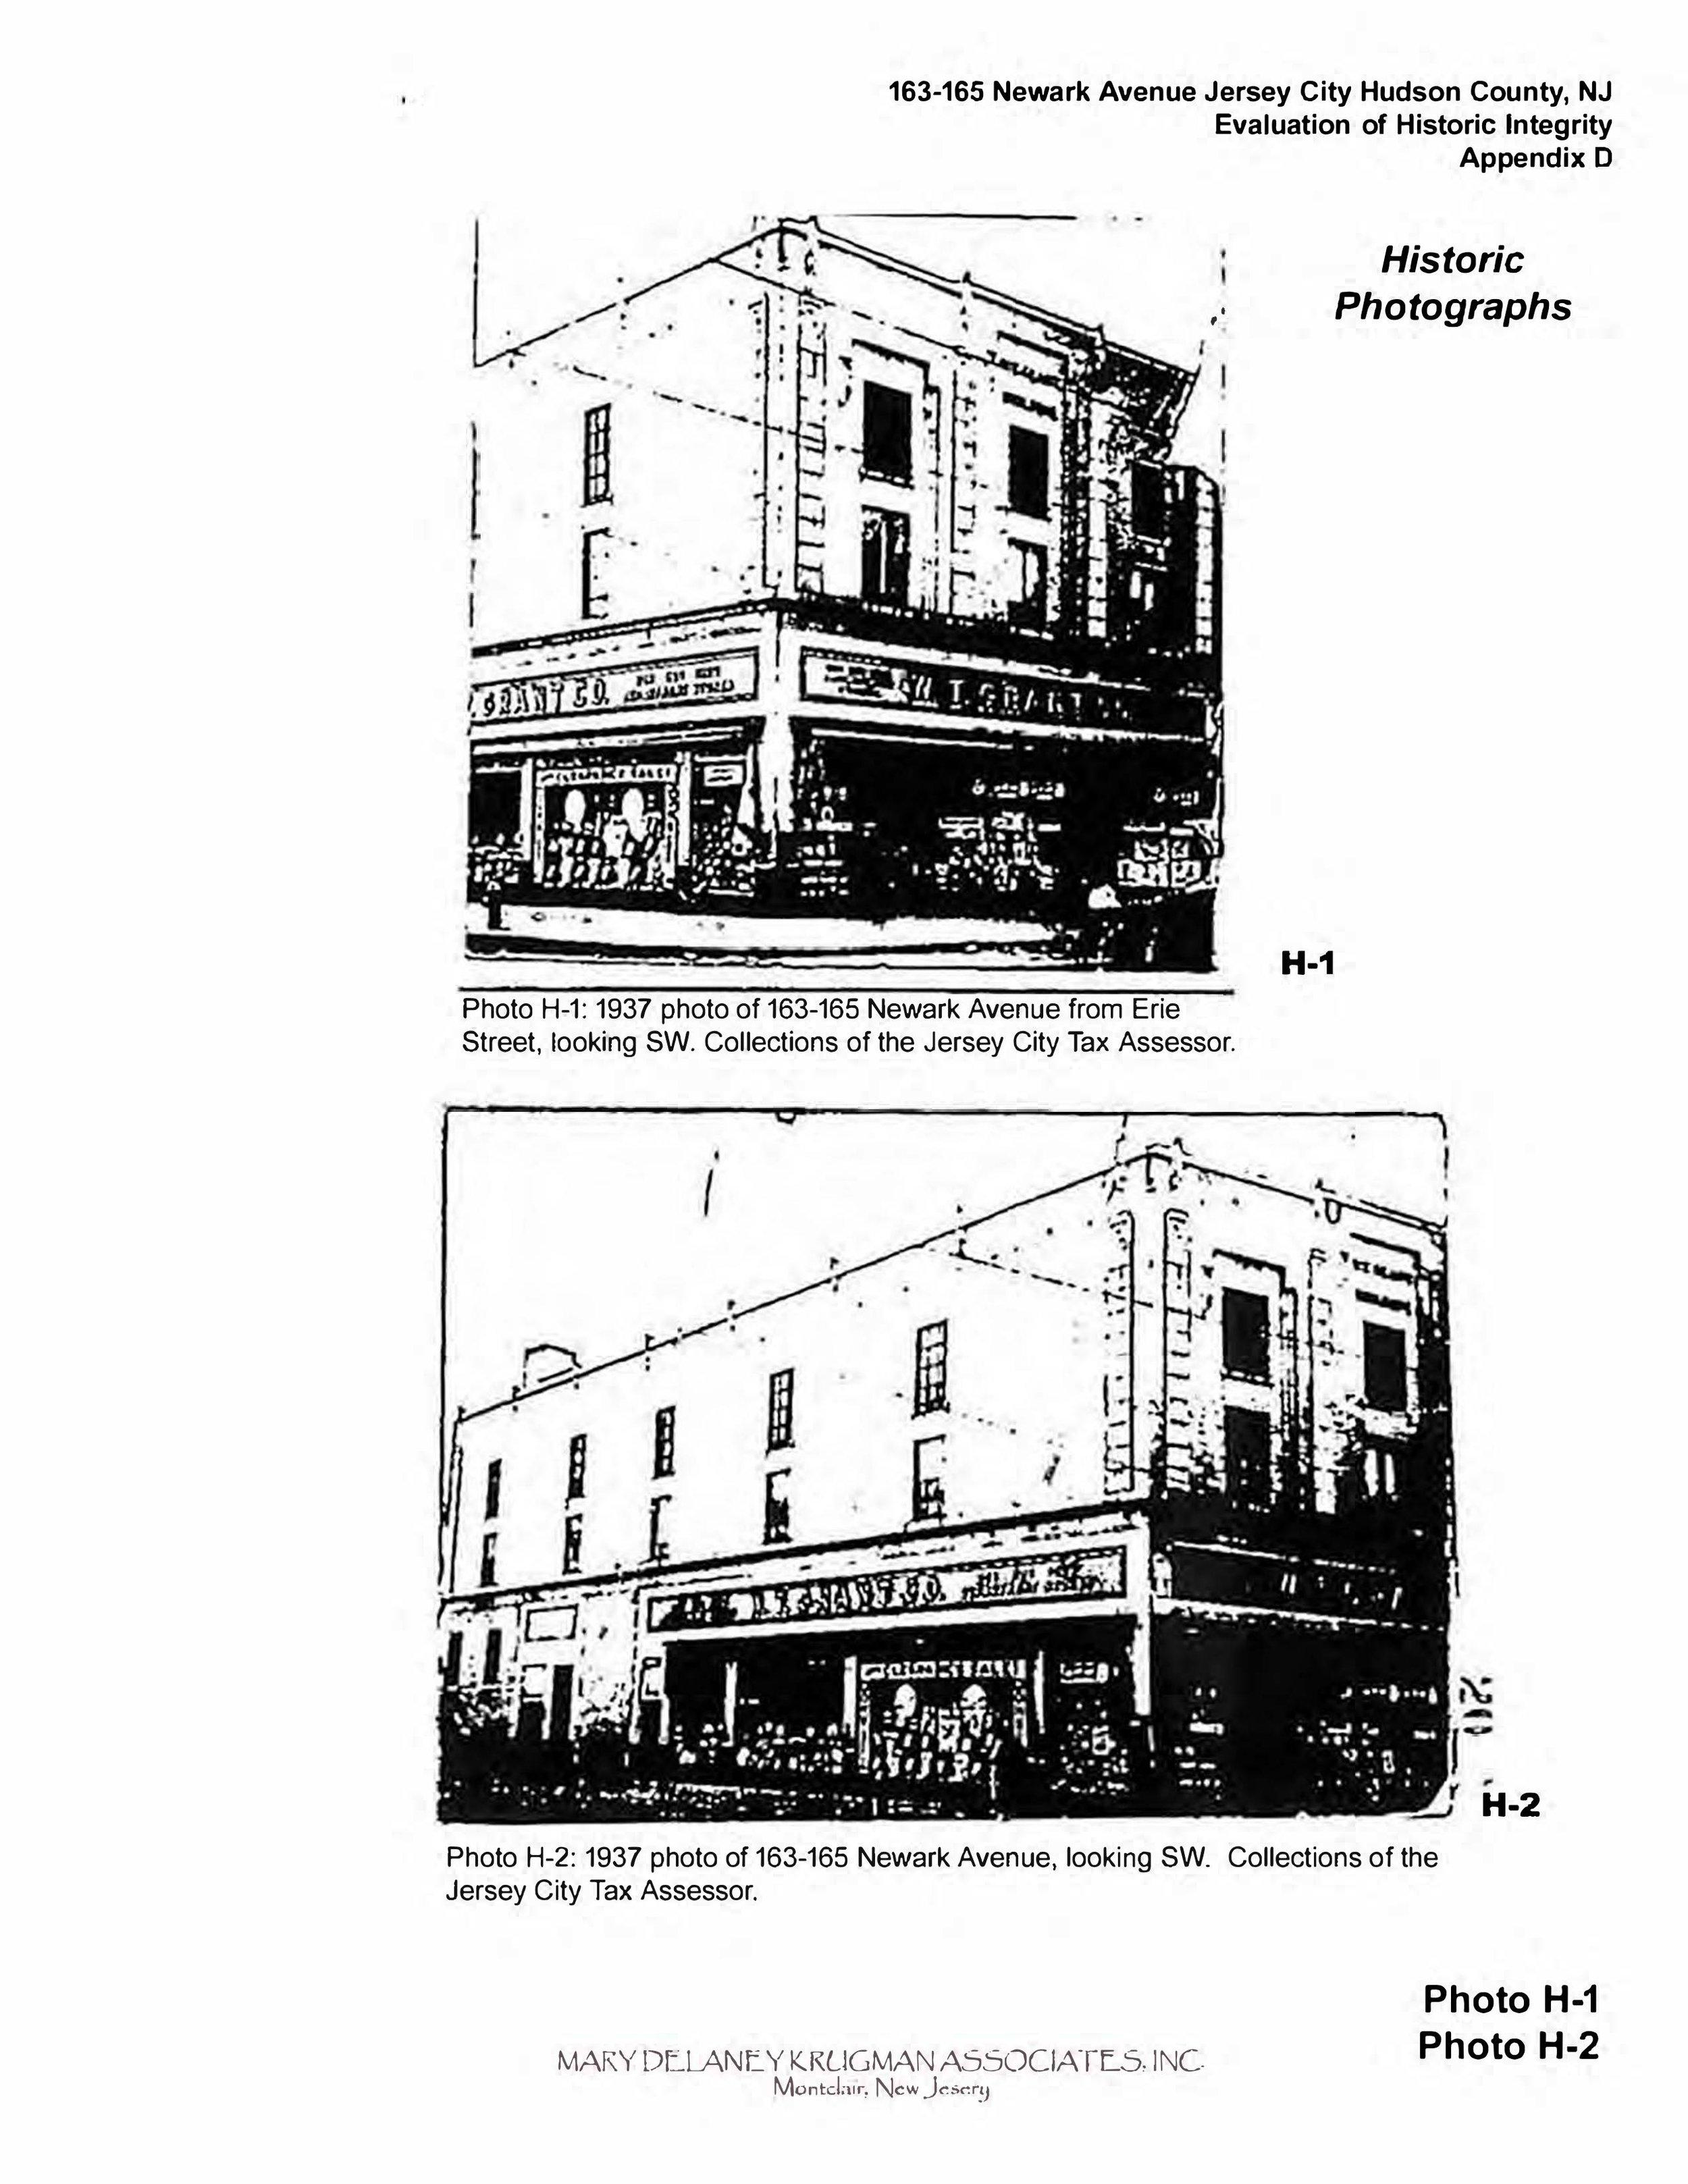 Historic Images 1.jpg